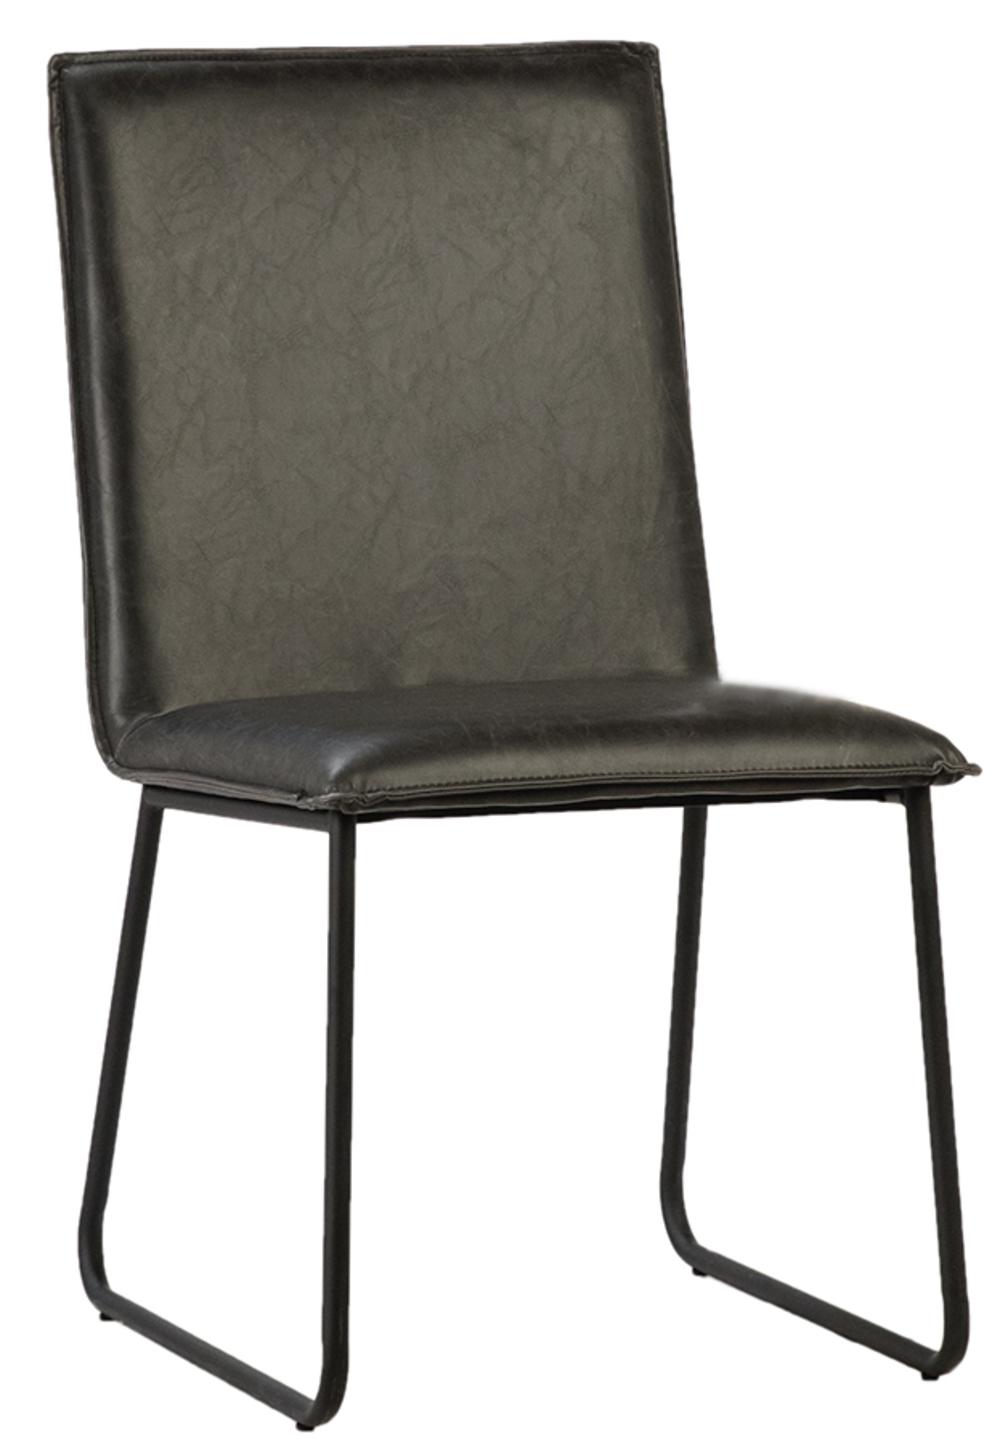 Dovetail Furniture - Gordola Dining Chair